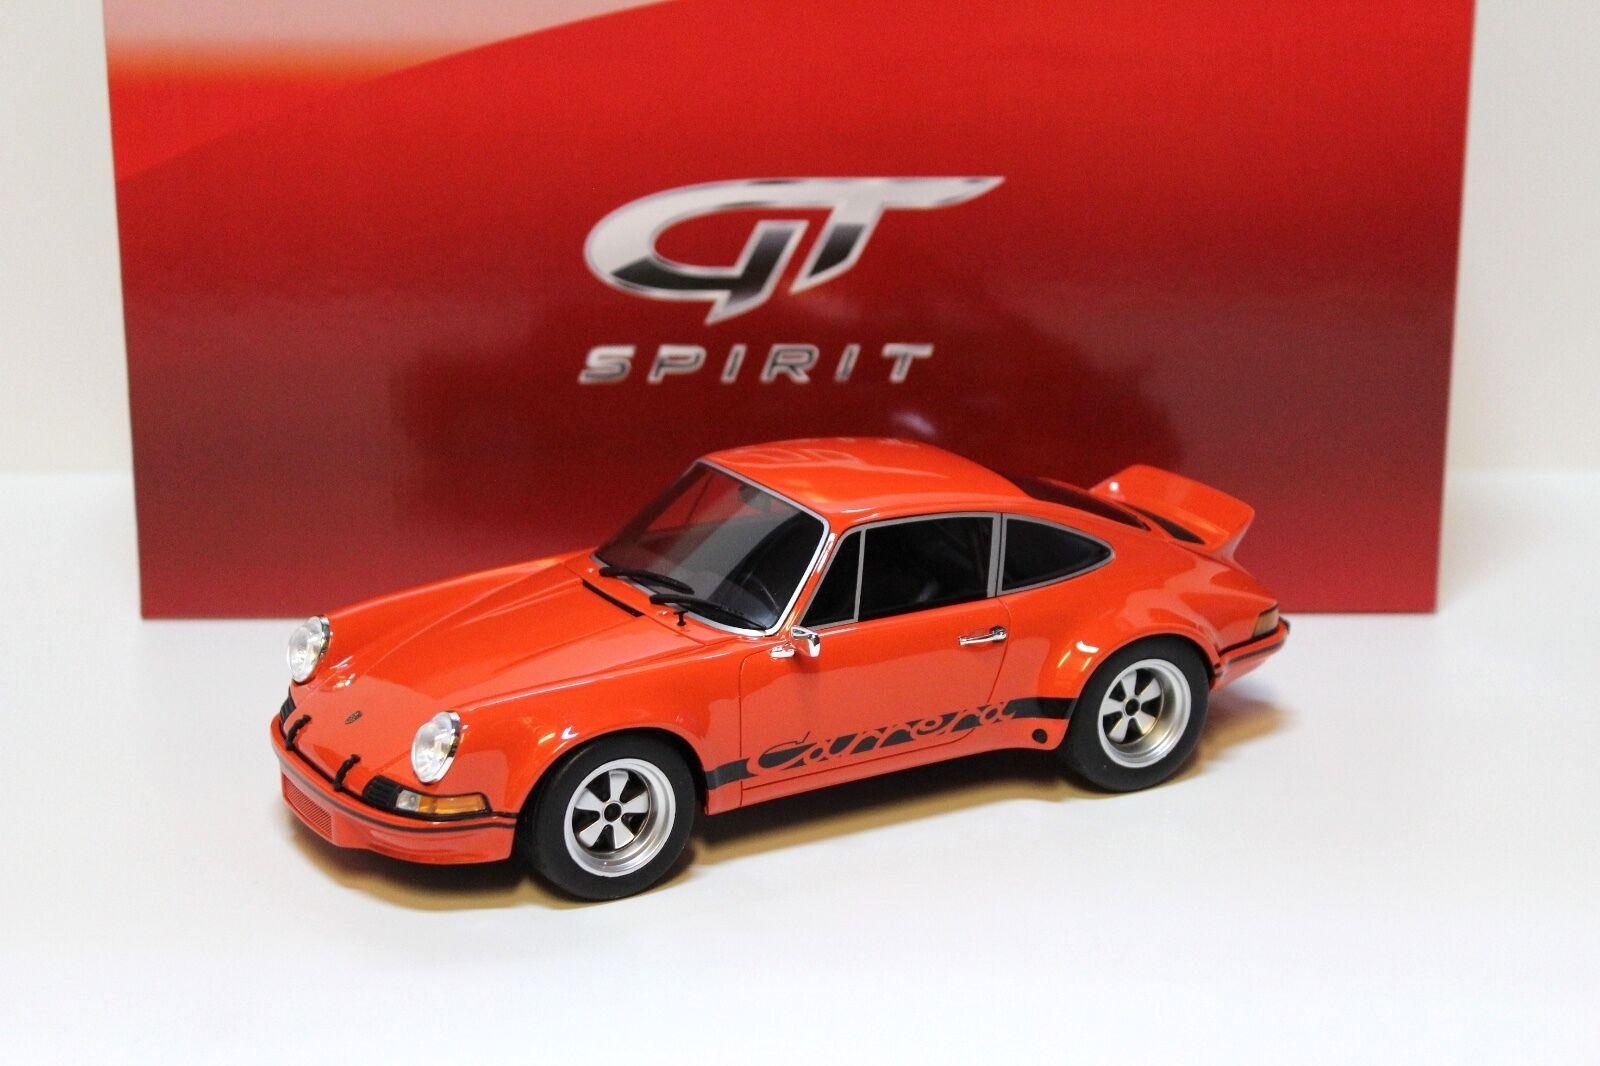 1 18 GT spirit porsche 911 rsr 2.8l - 1973-Orange New chez premium-MODELCARS